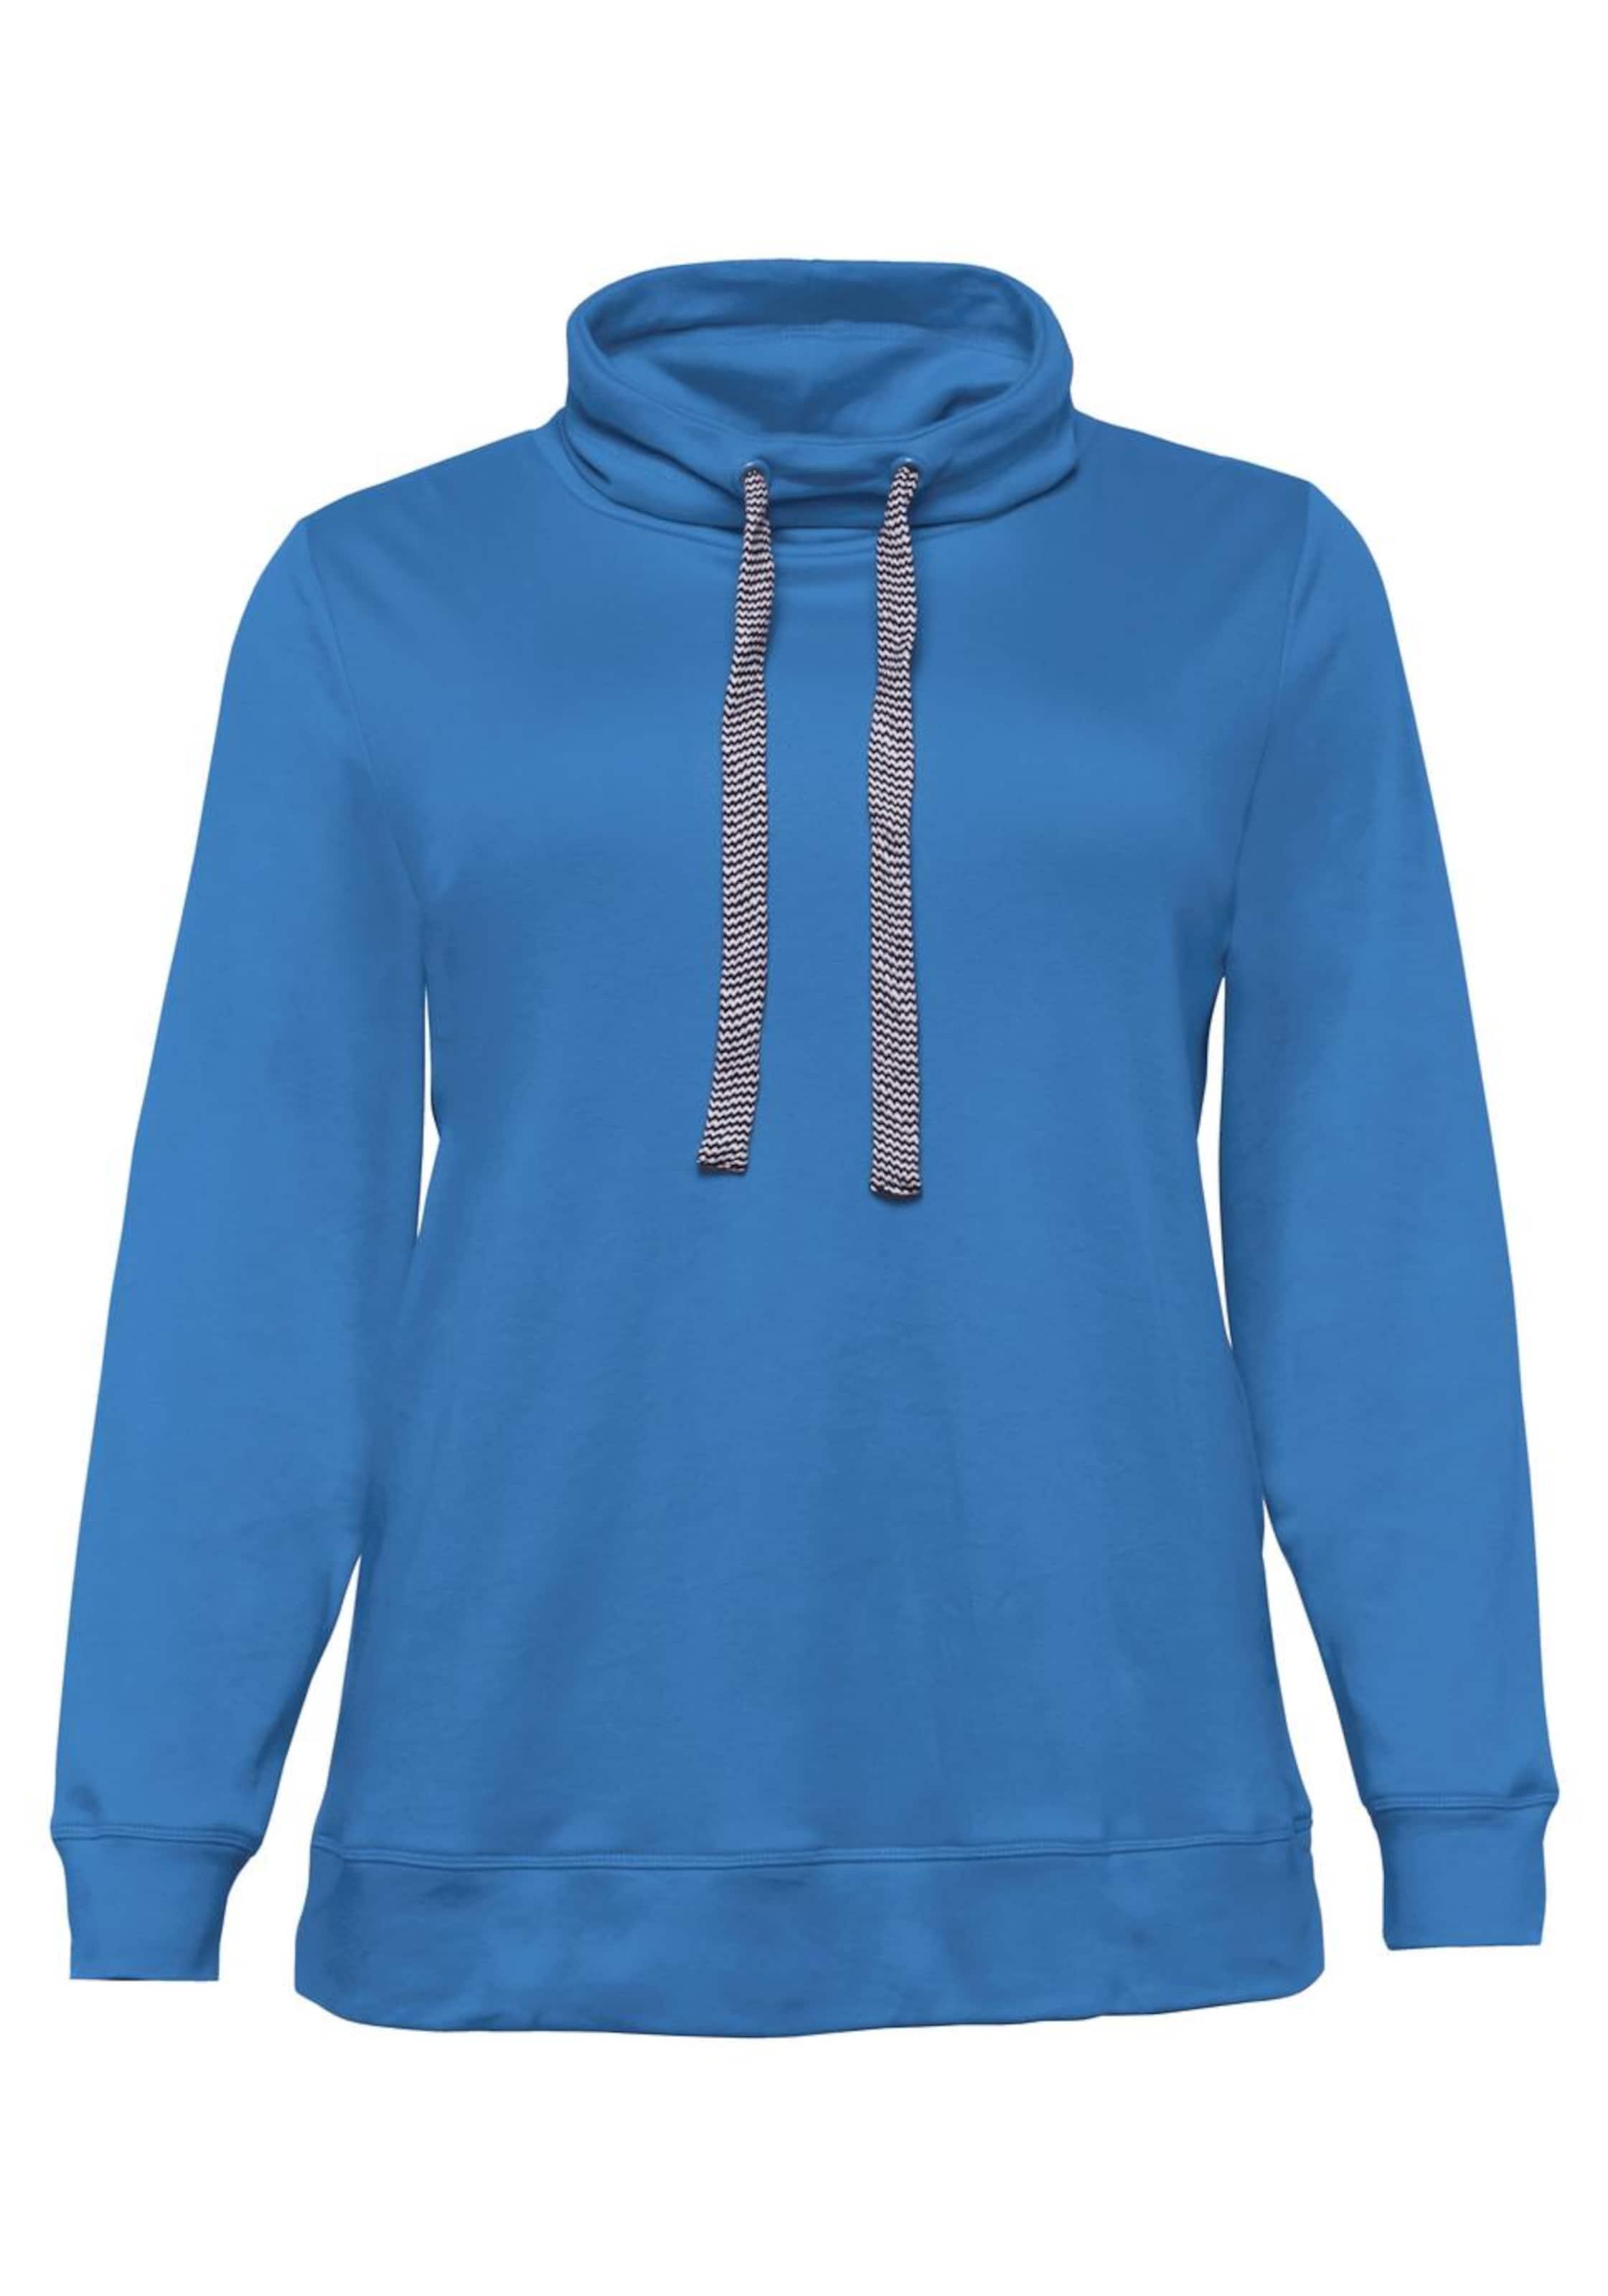 Sheego Sweatshirt In Sweatshirt In Royalblau Sheego Royalblau H2WE9DI